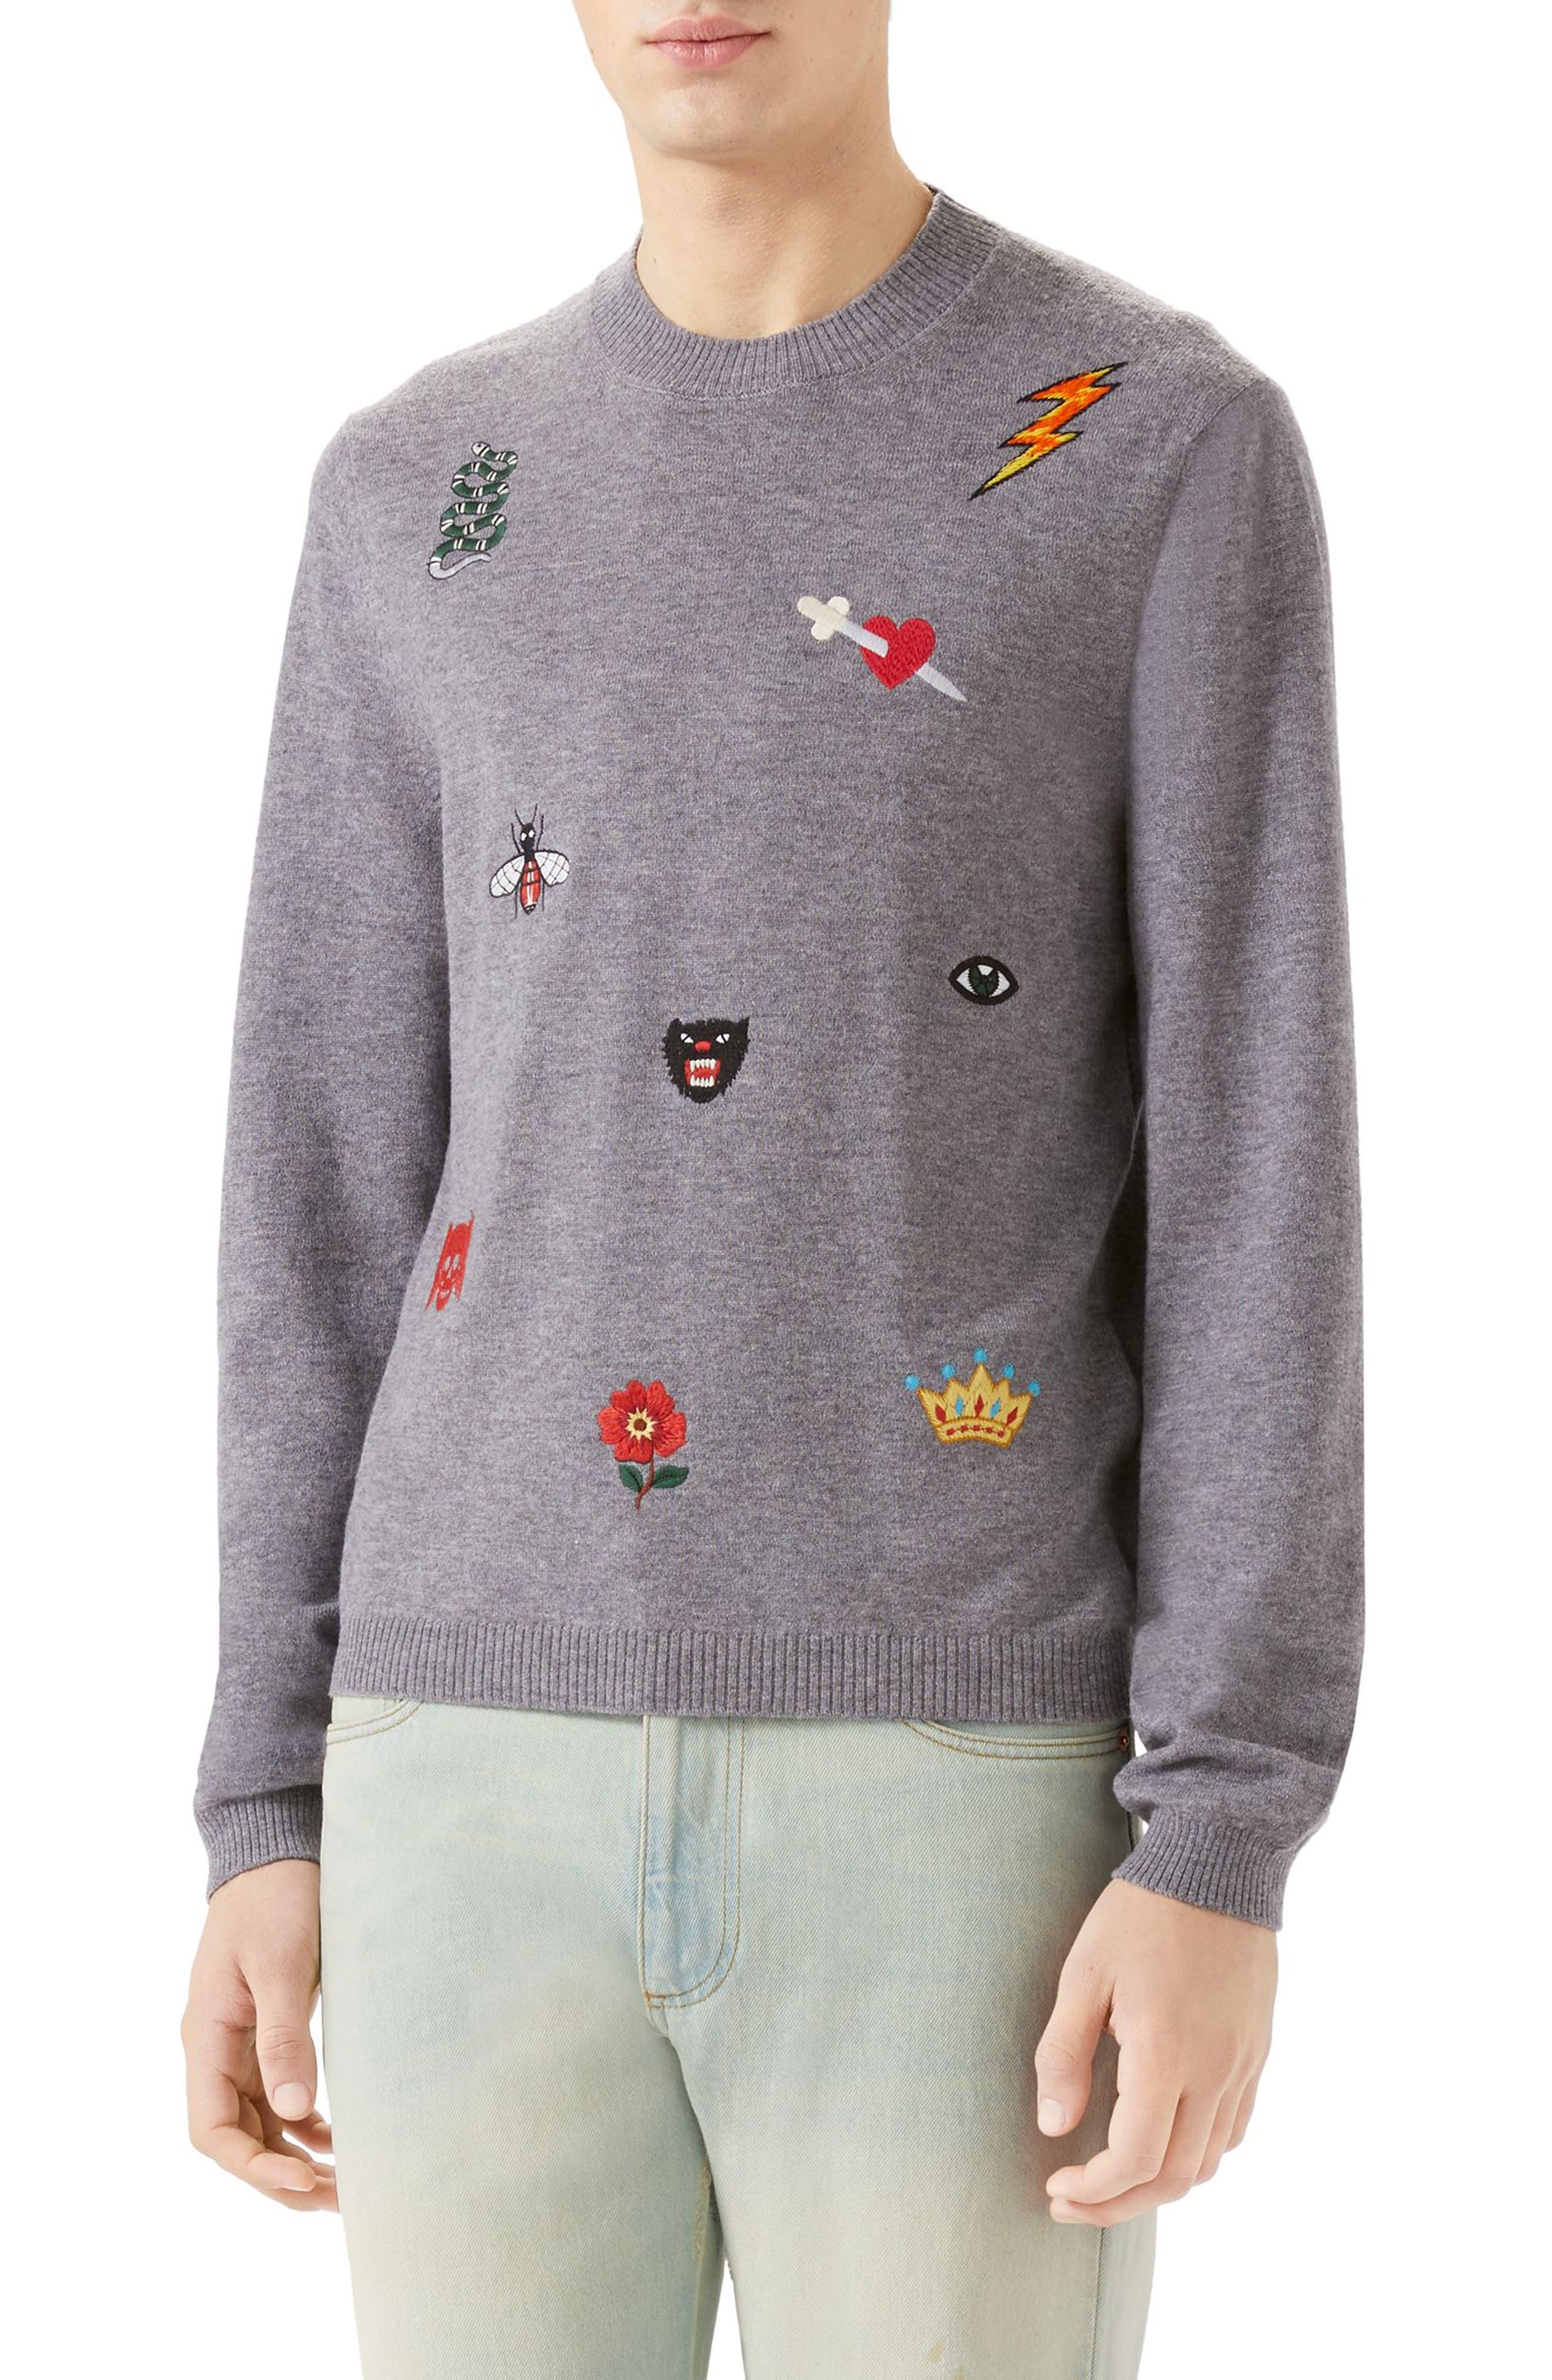 Embroidered Wool Crewneck Sweater,                             Main thumbnail 1, color,                             MEDIUM GREY